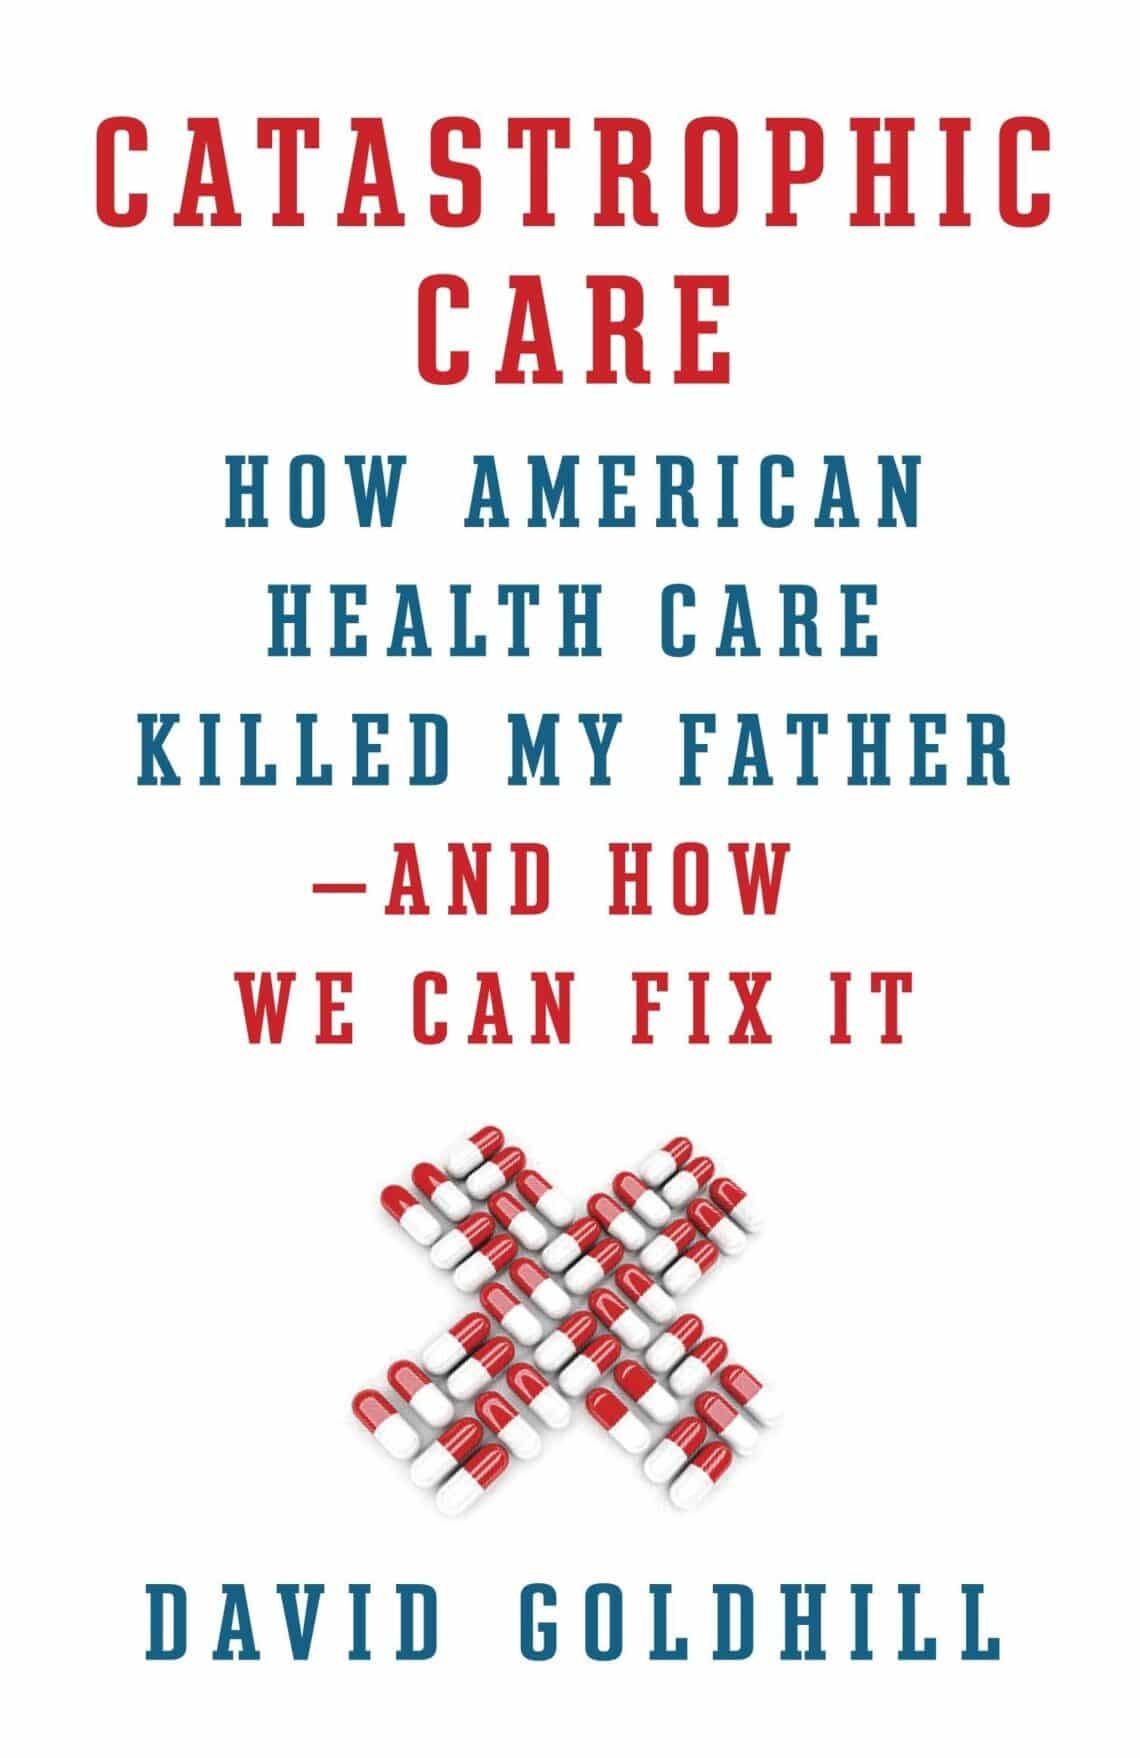 david-goldhill-to-speak-on-preventing-catastrophe-in-health-care